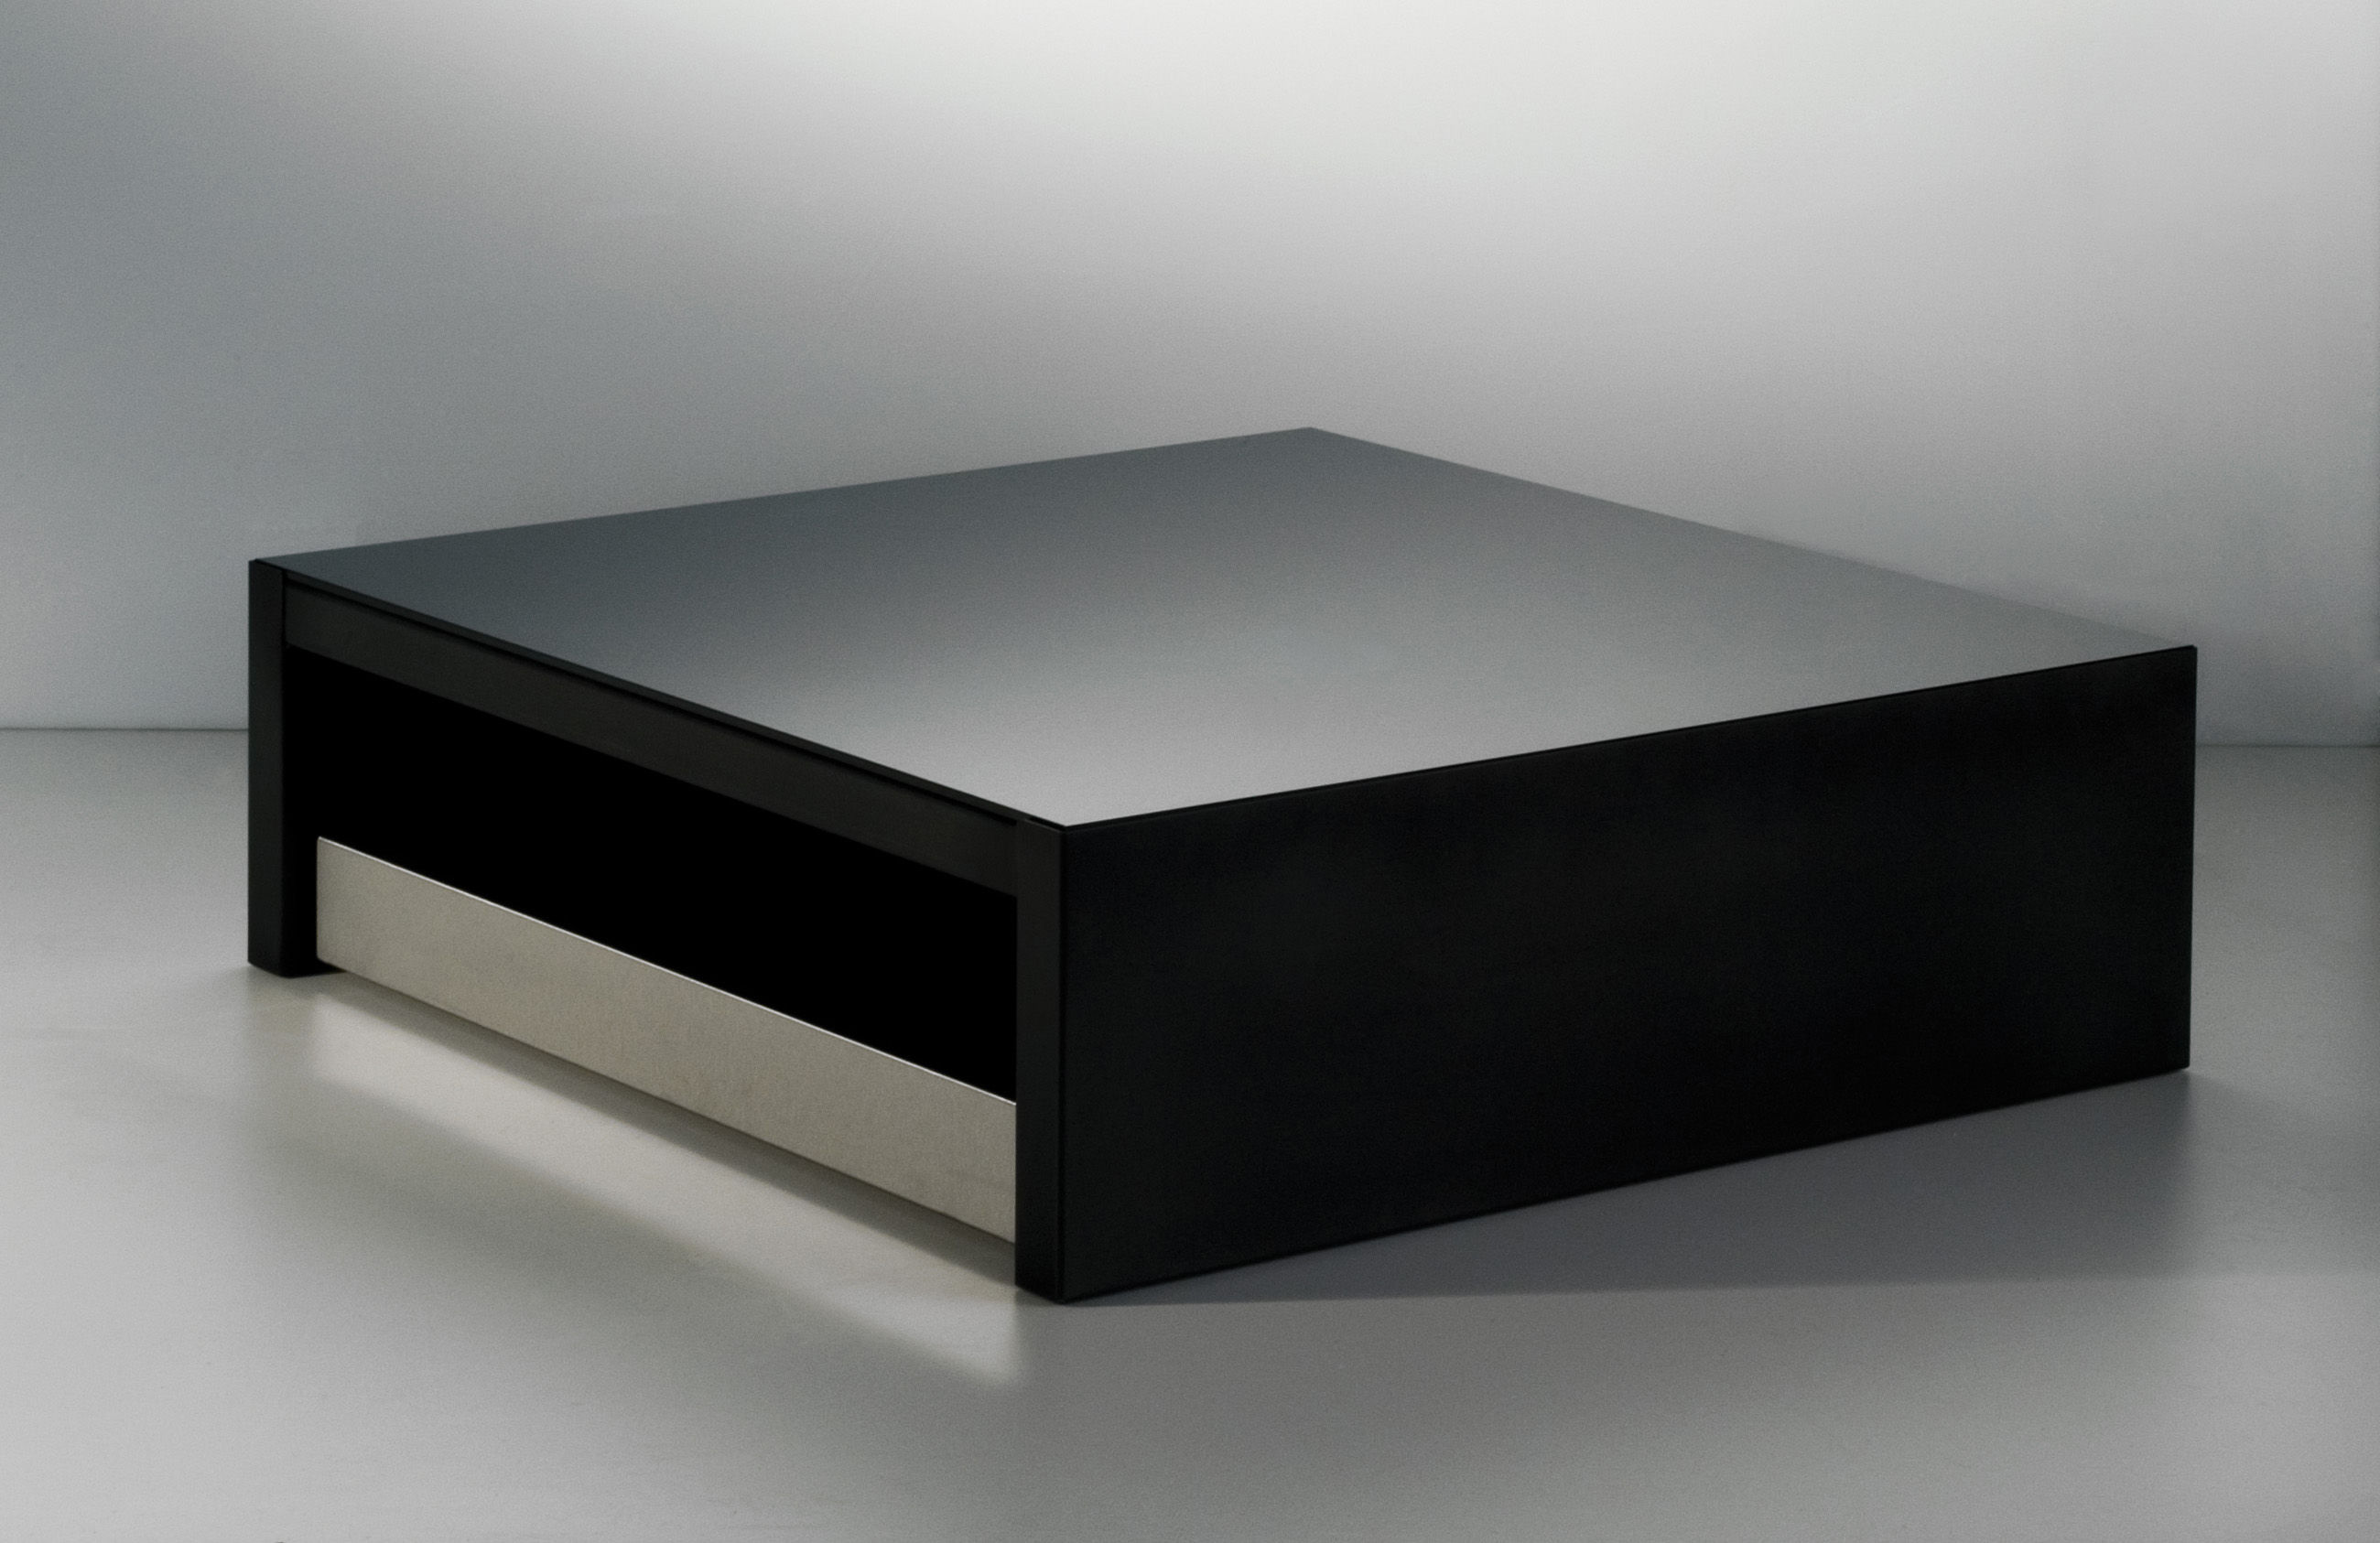 table basse max moritz verre noir acier phosphat et verre noir inox 100x100 cm zeus. Black Bedroom Furniture Sets. Home Design Ideas